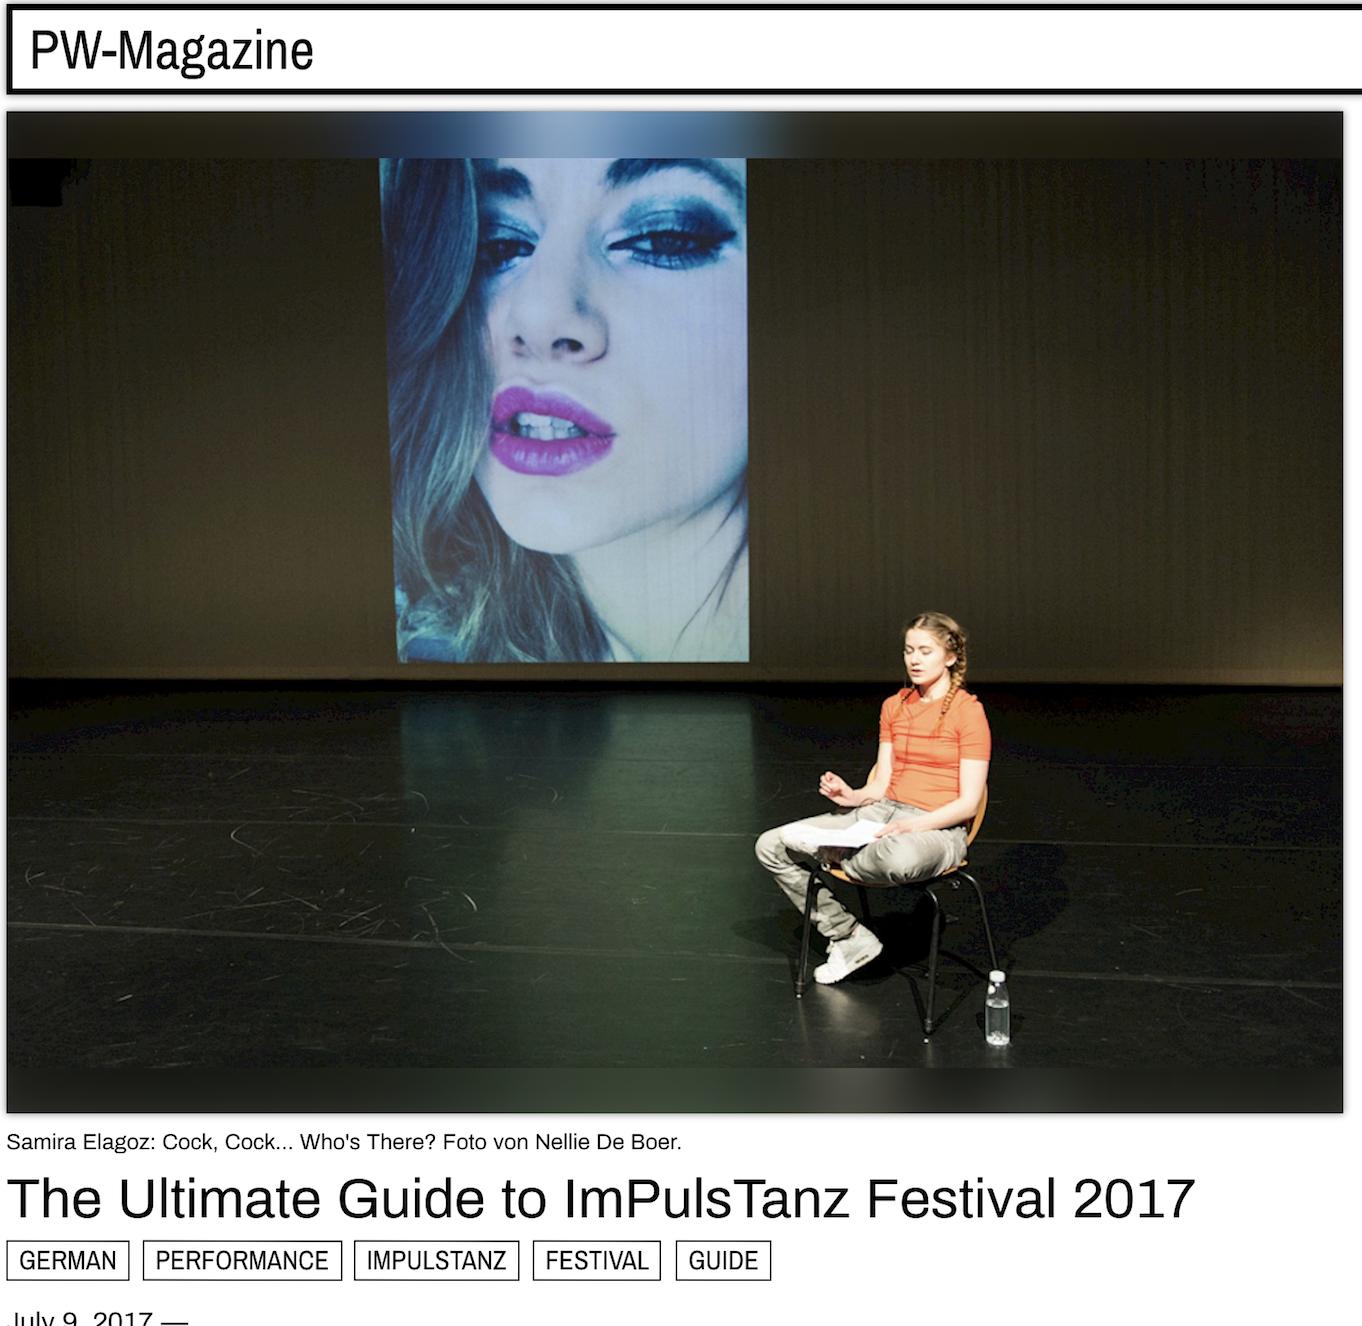 PW MAGAZINE     Recommendations for Impulstanz Festival